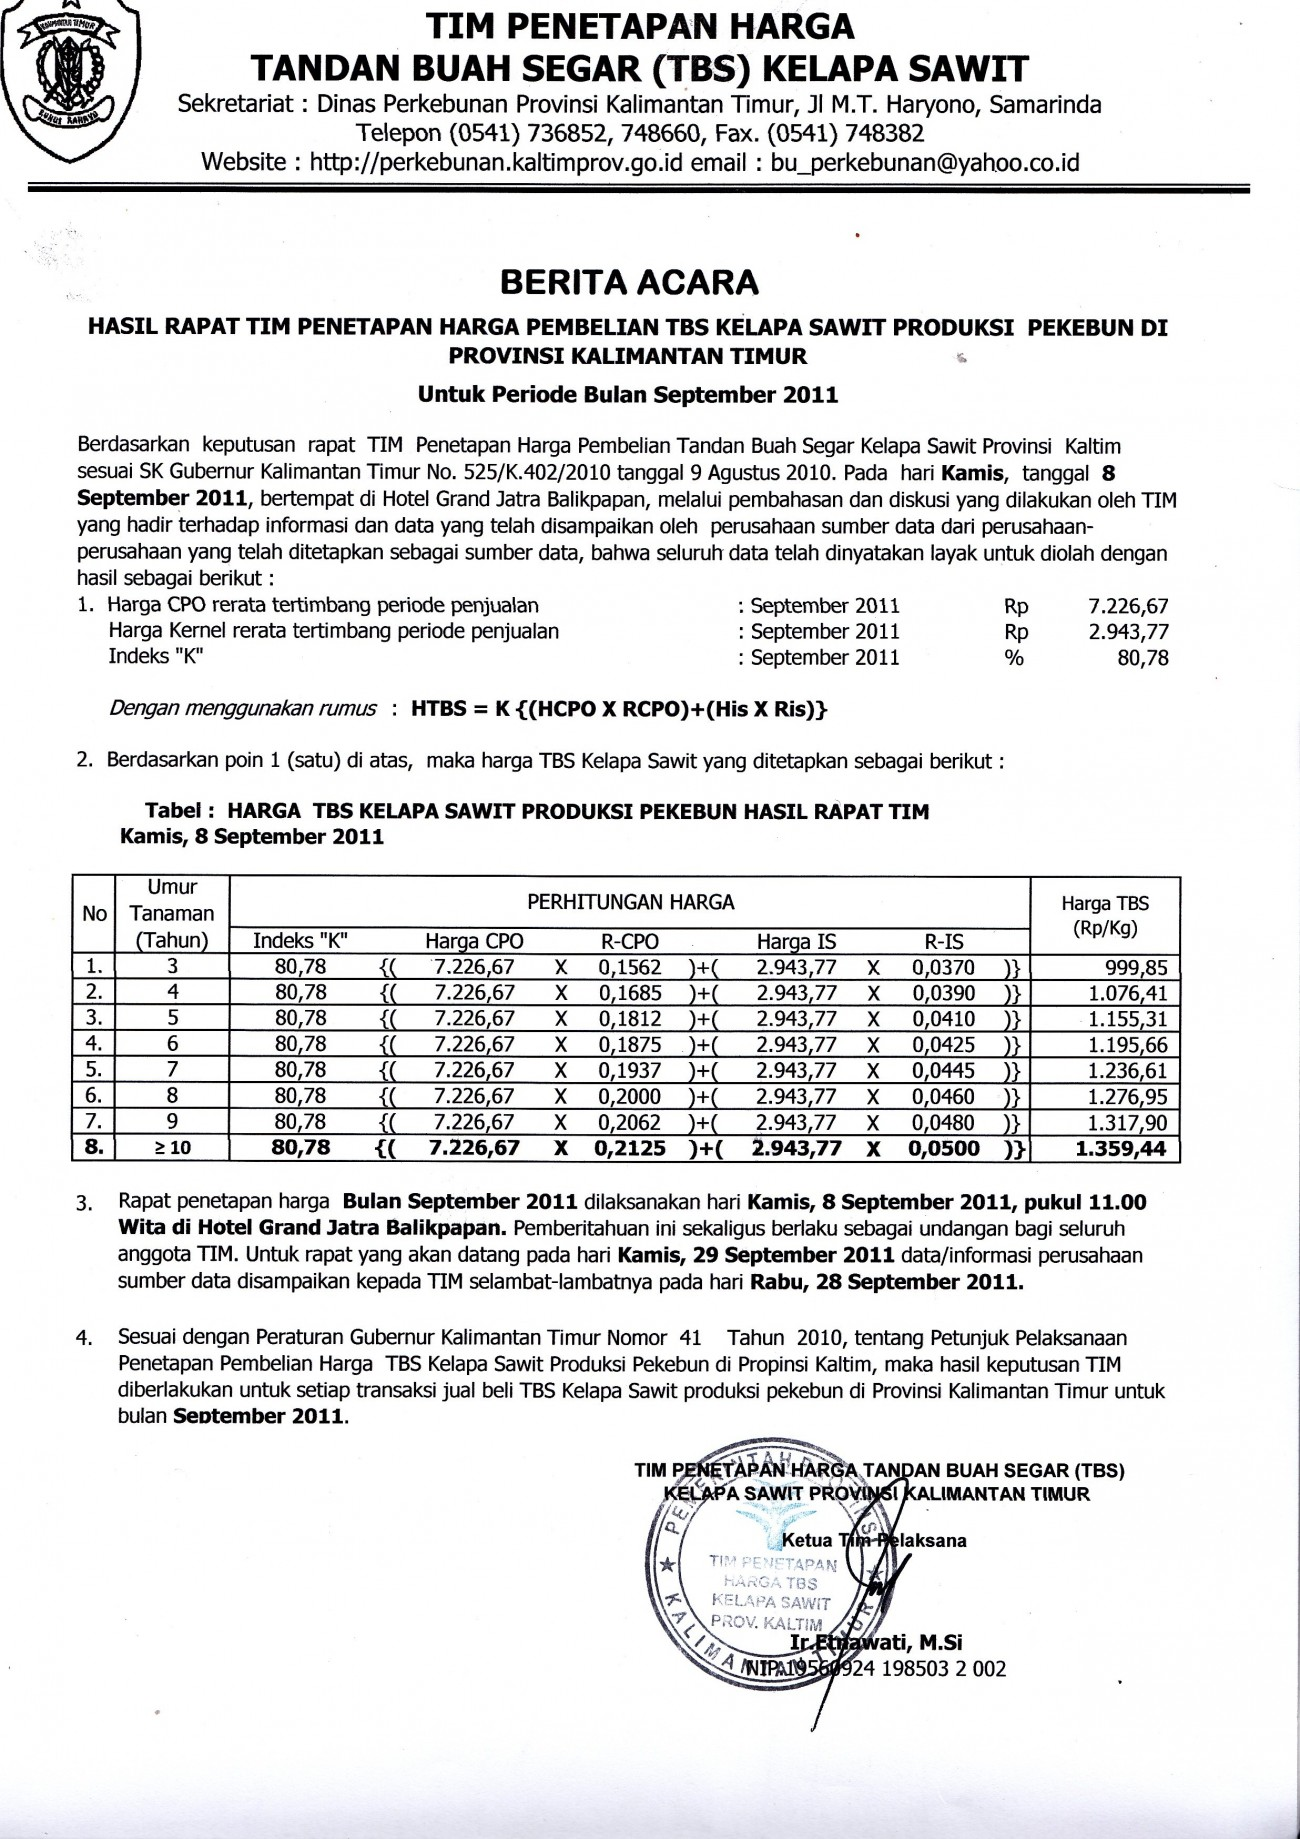 Informasi Harga TBS Kelapa Sawit untuk Bulan September 2011